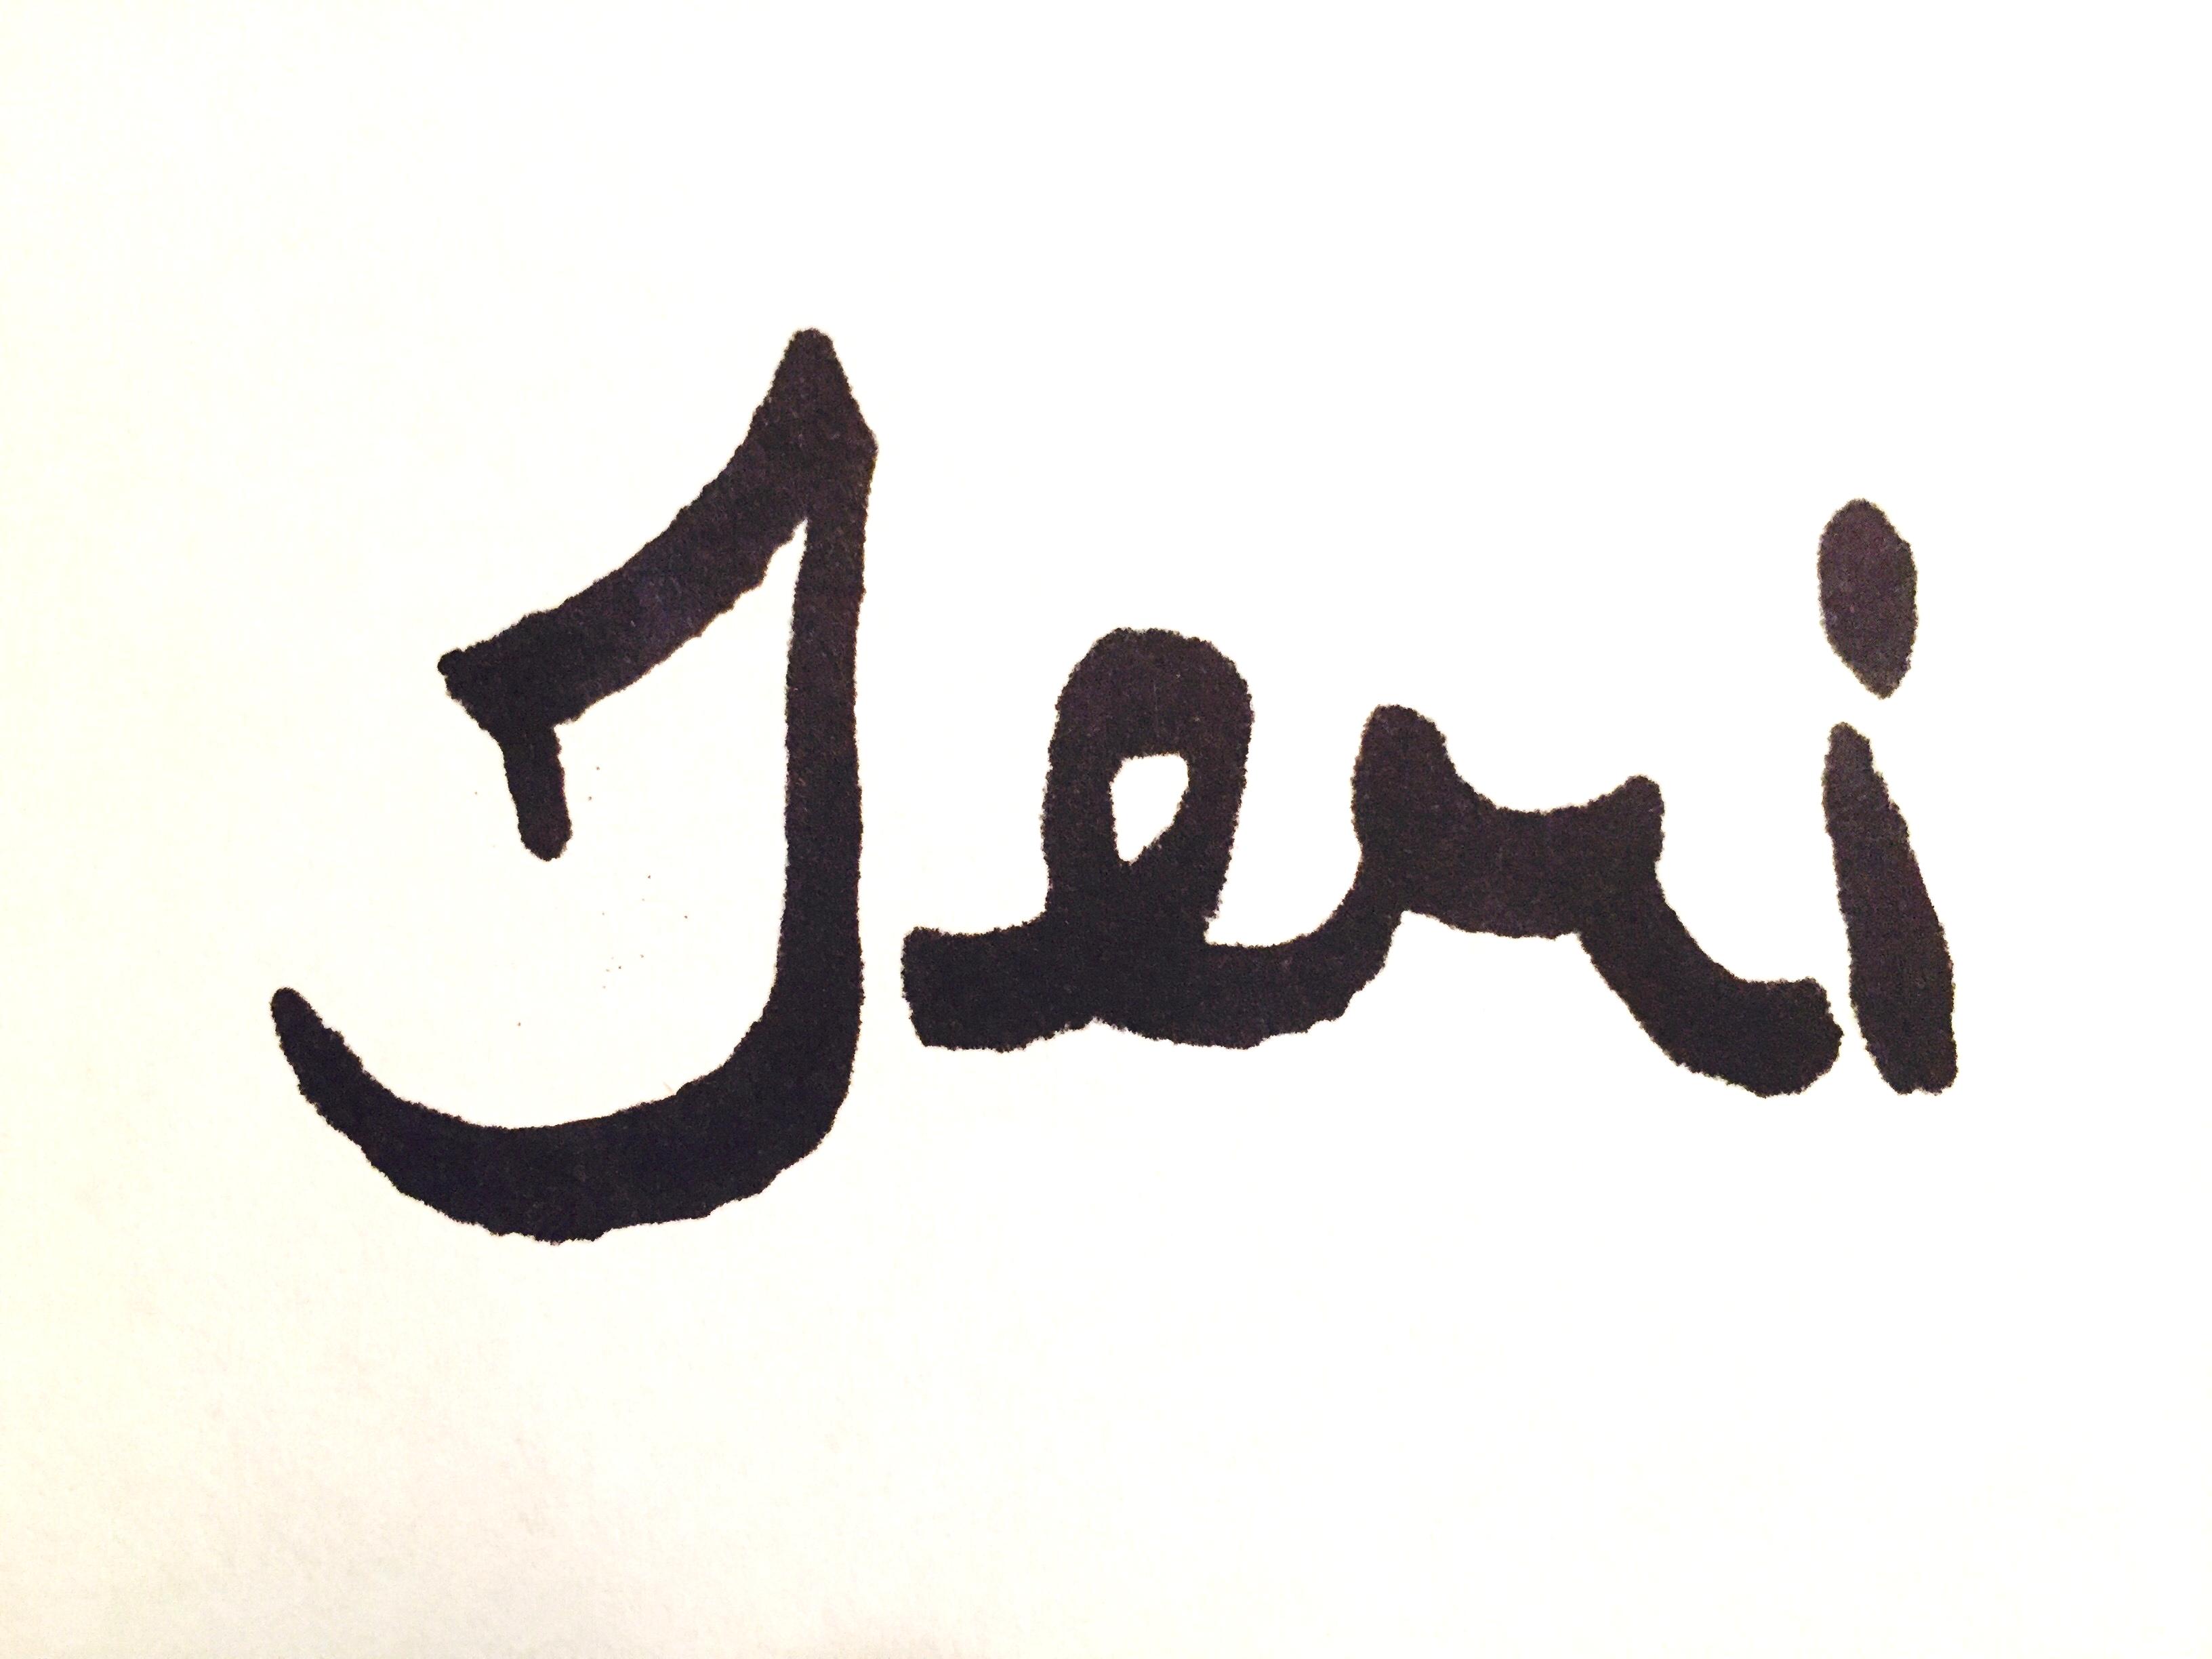 tlevine101's Signature